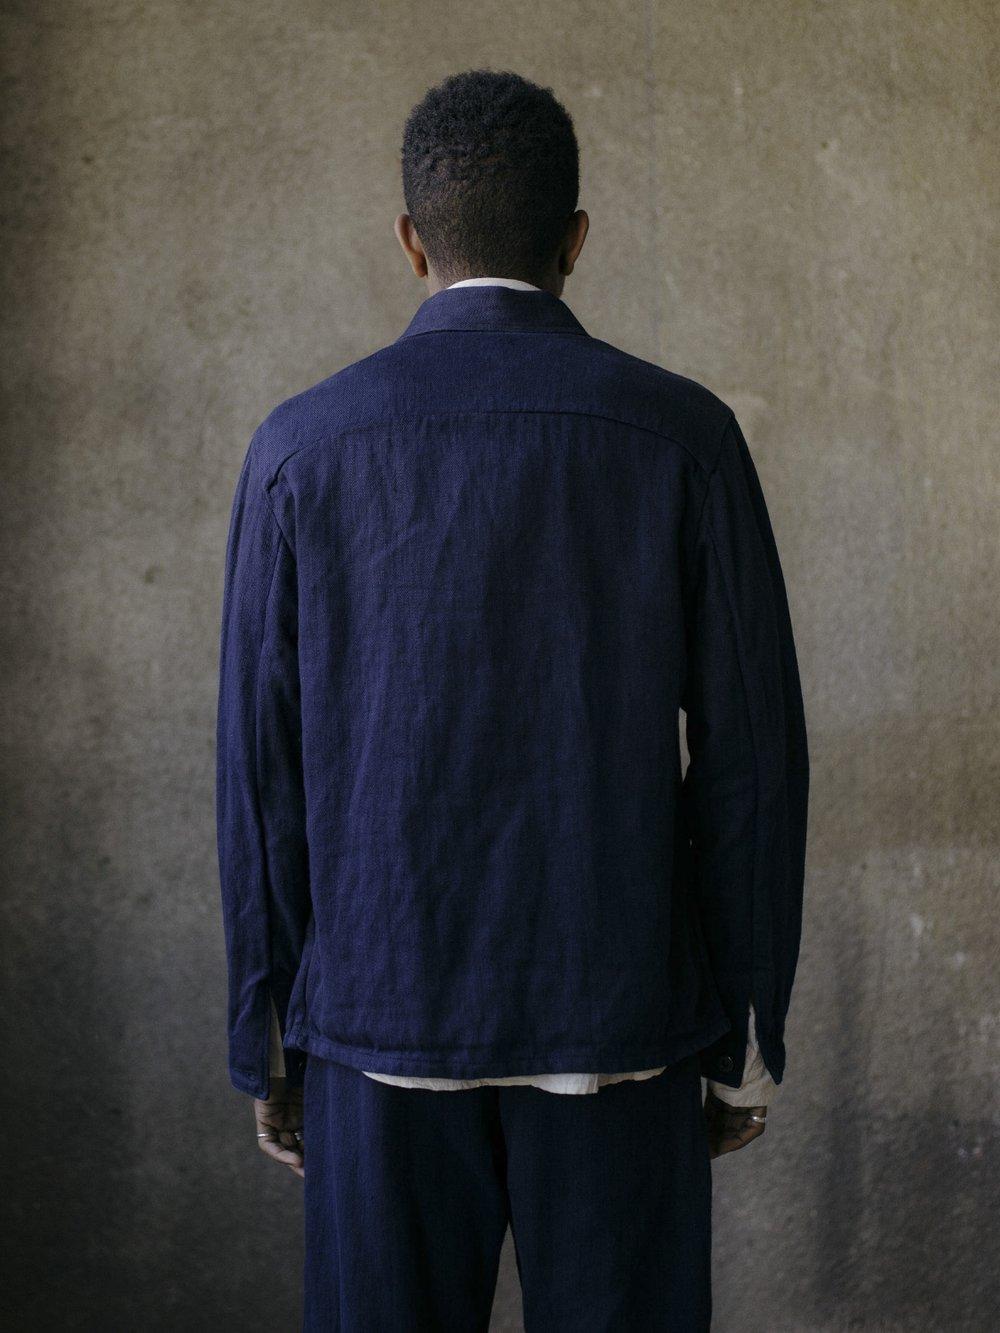 evan-kinori-three-pocket-jacket-french-blue-hemp-twill-4